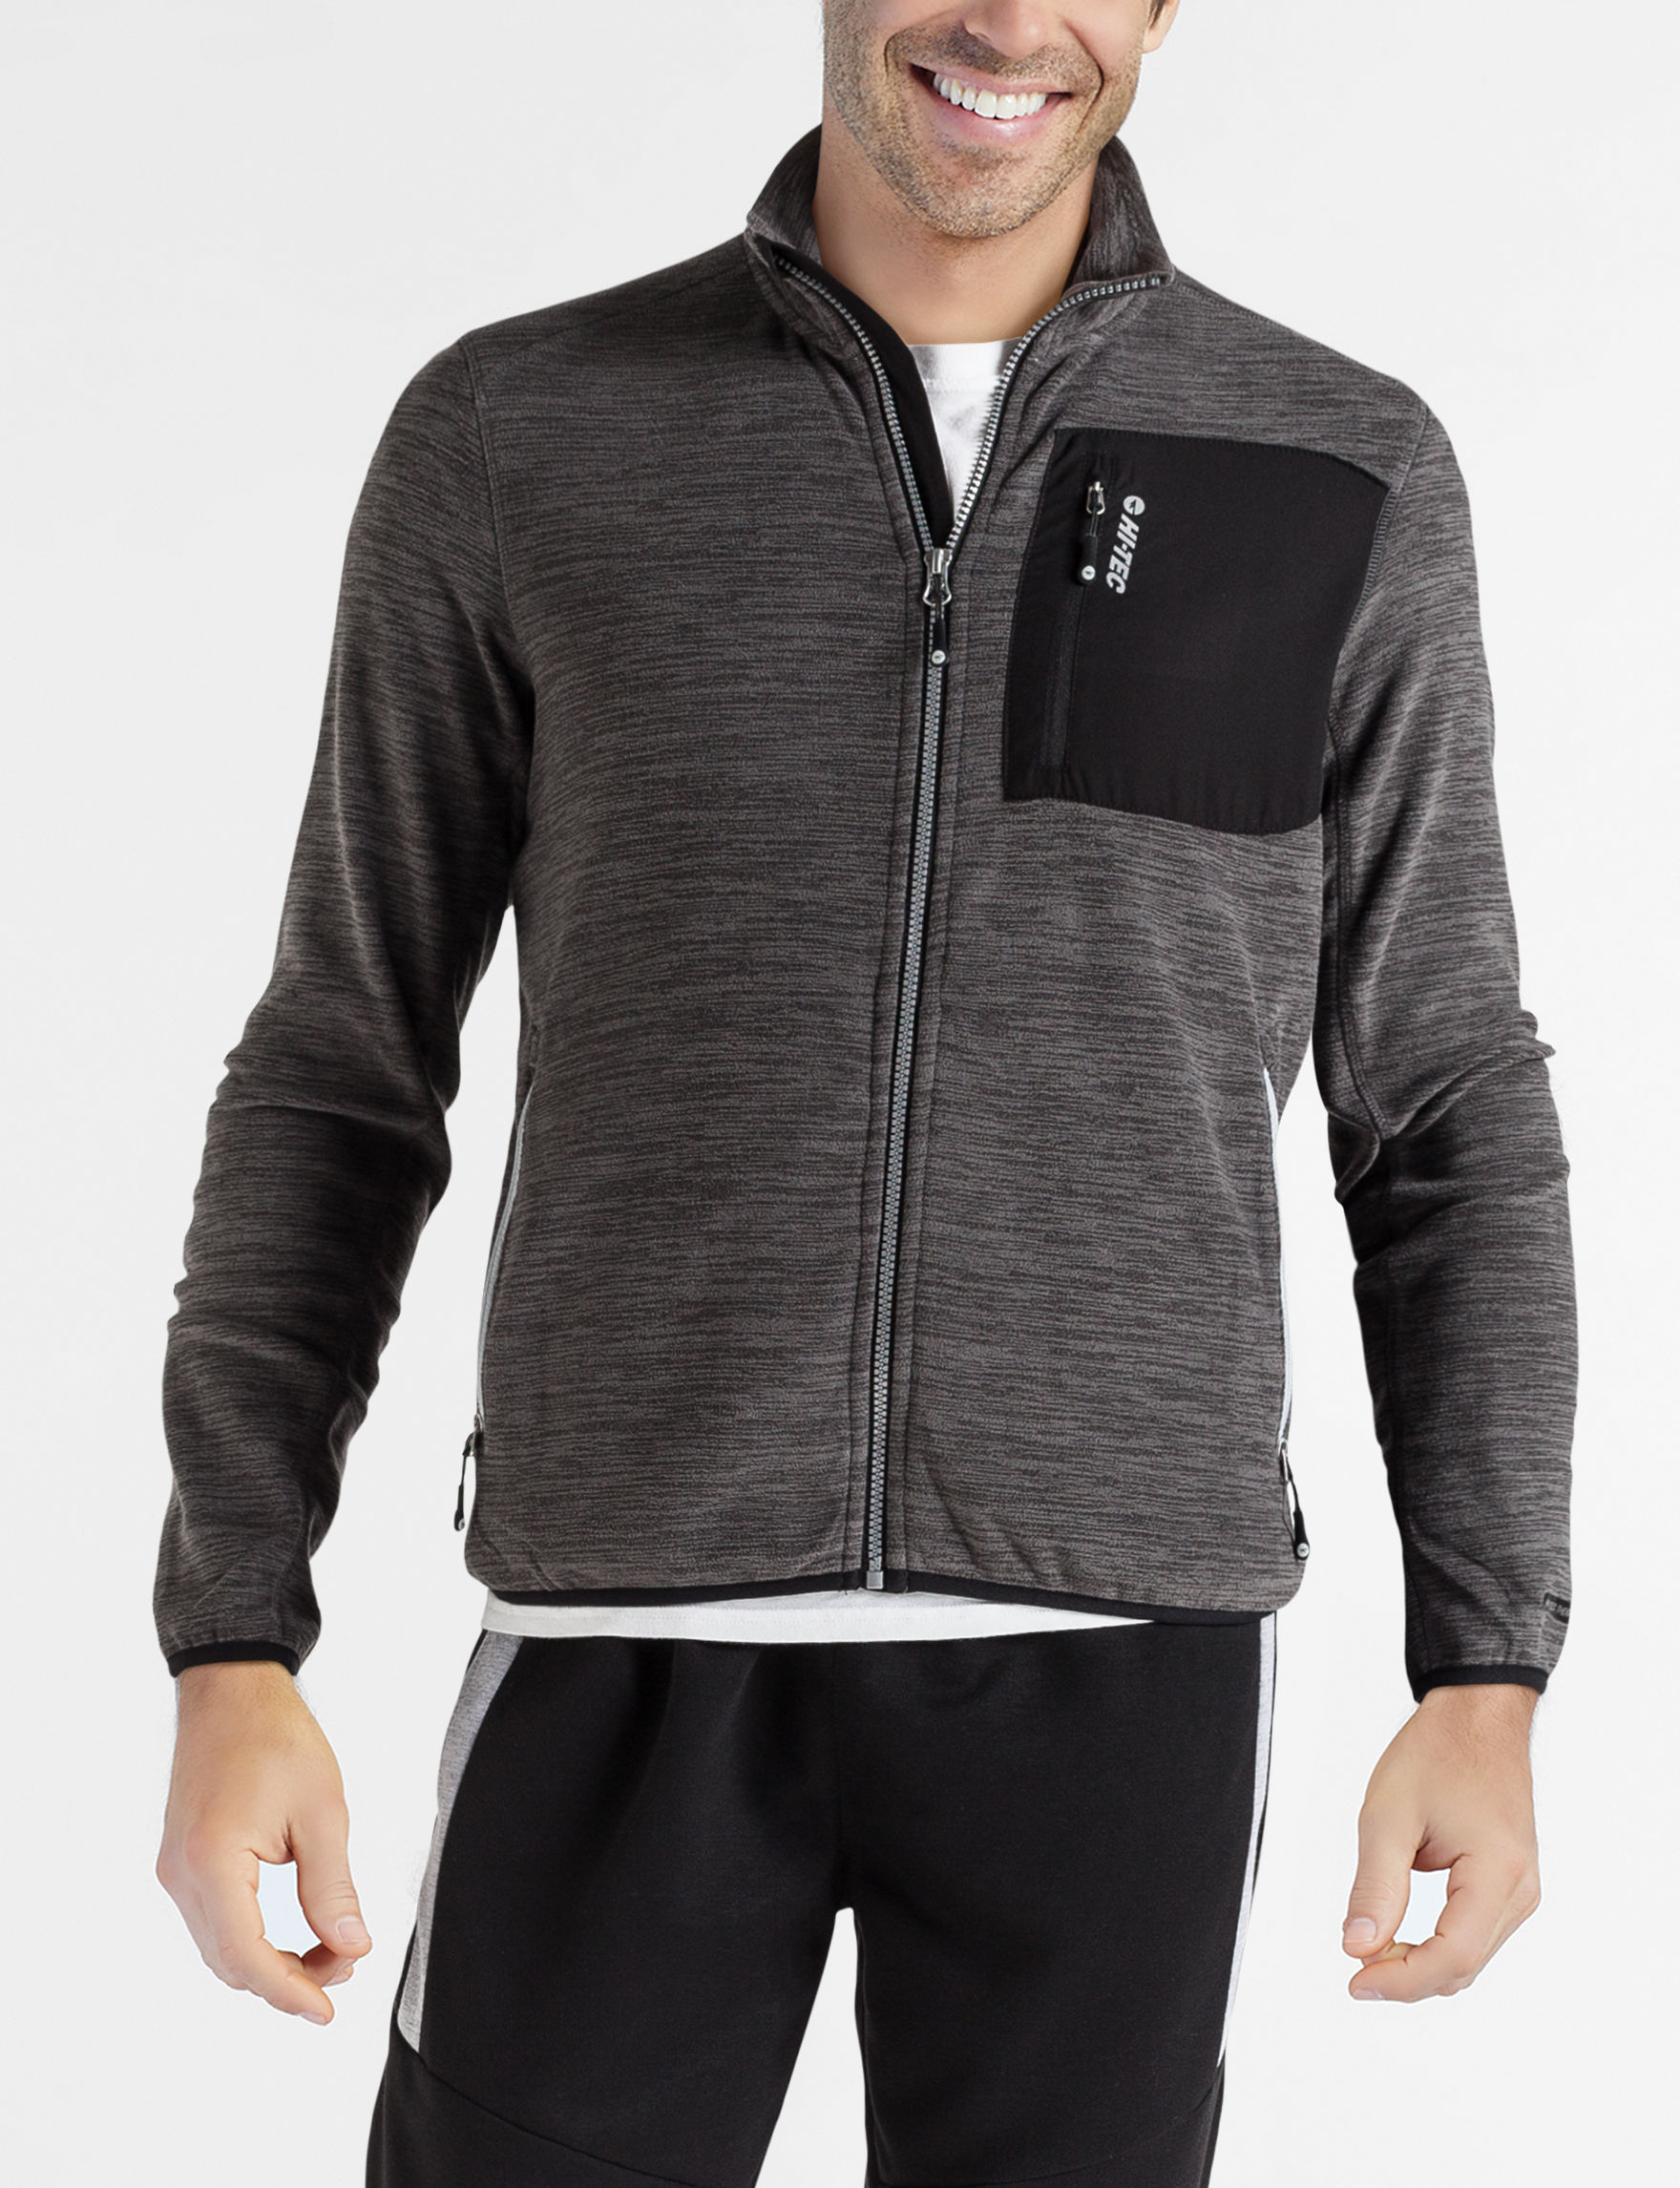 Hi-Tec Charcoal / Black Fleece & Soft Shell Jackets